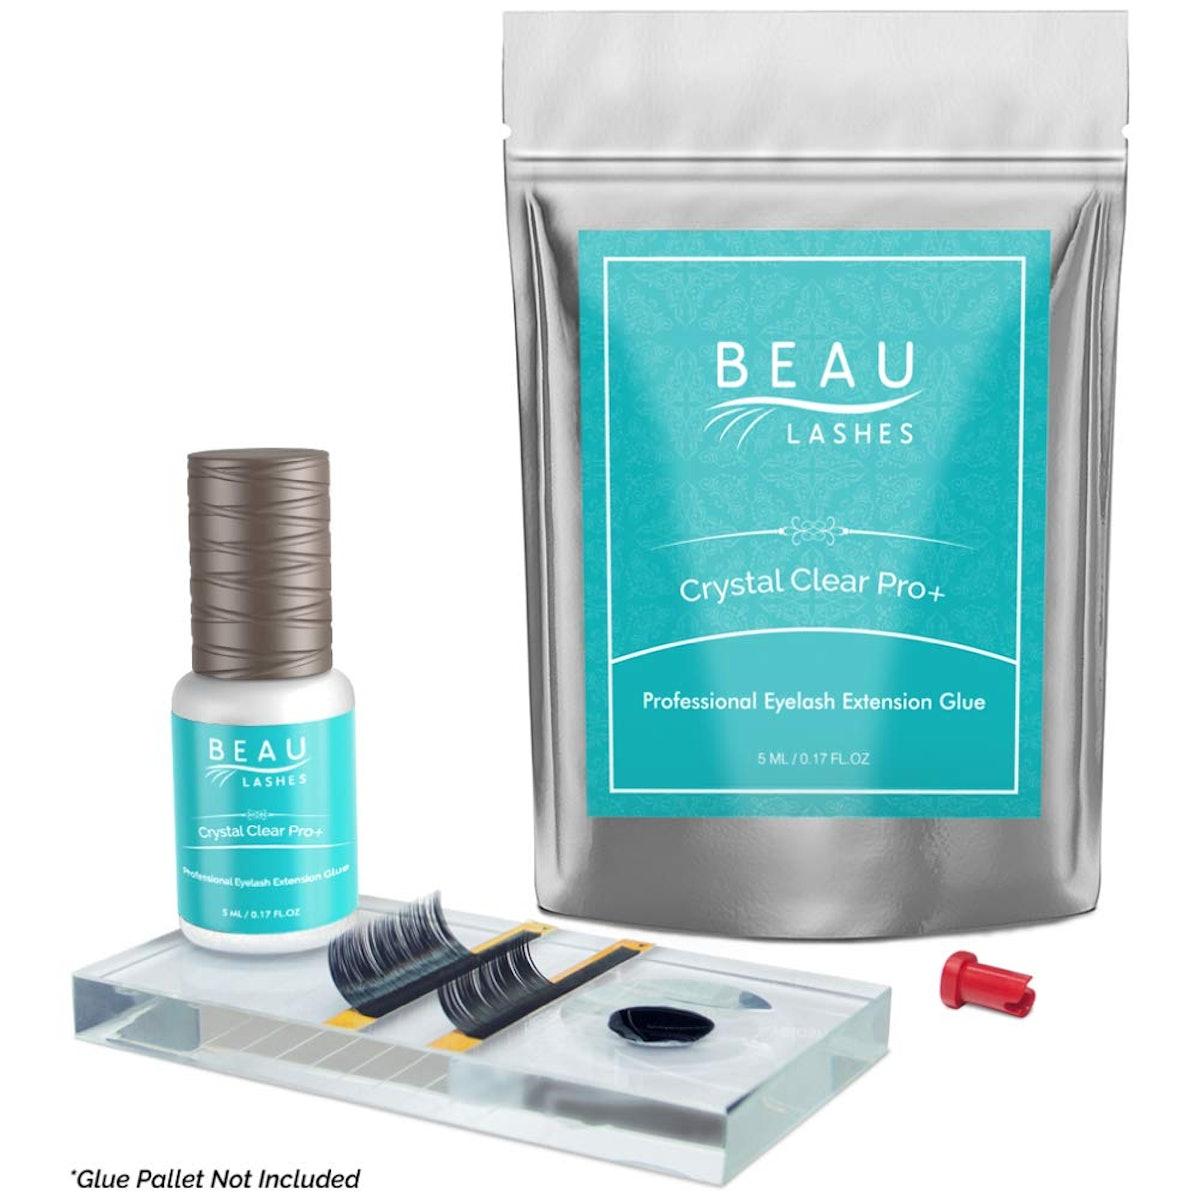 Beau Lashes Crystal Clear Professional Eyelash Extension Glue